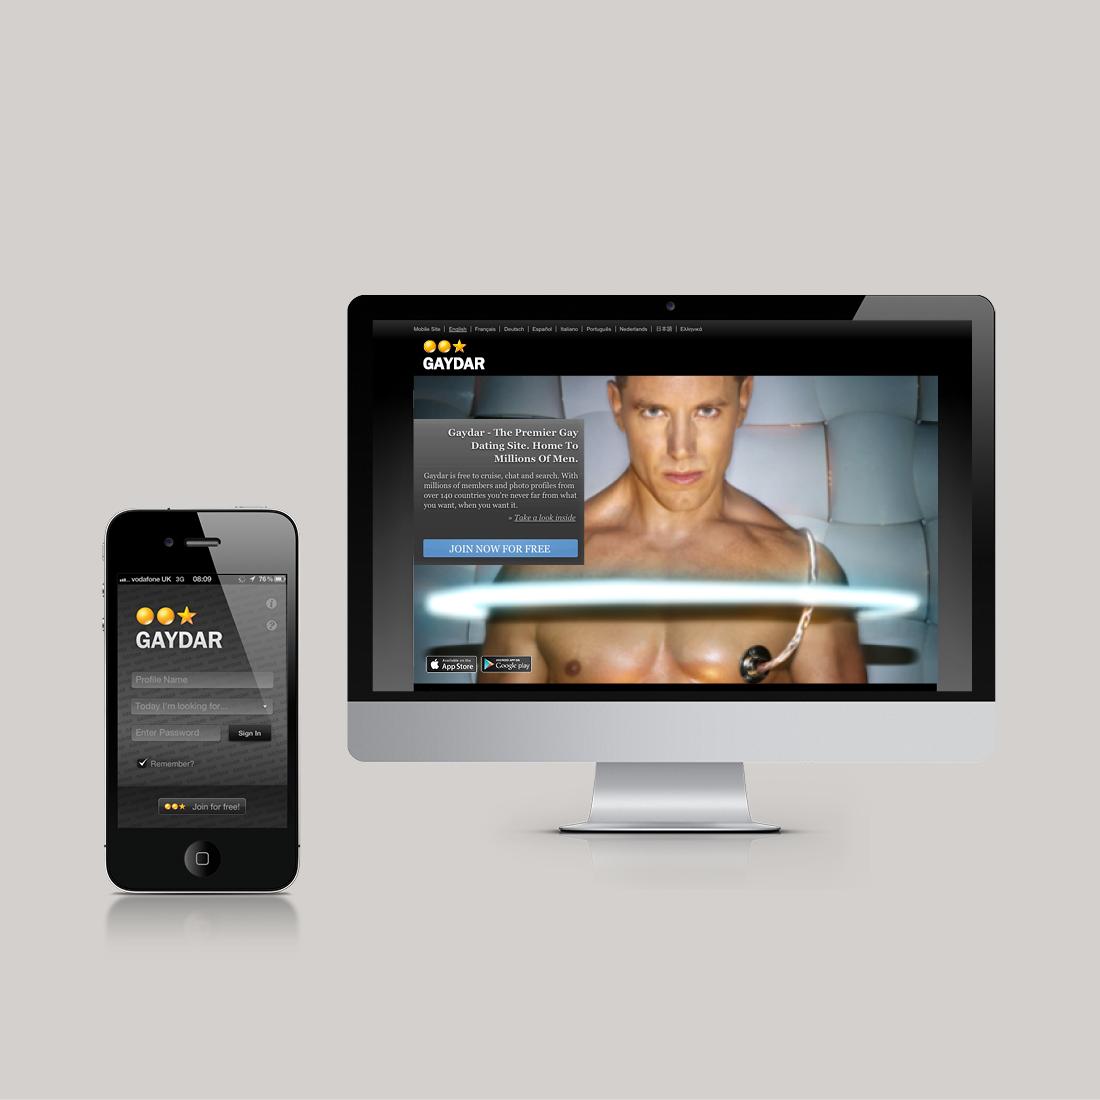 Gaydar Website and App